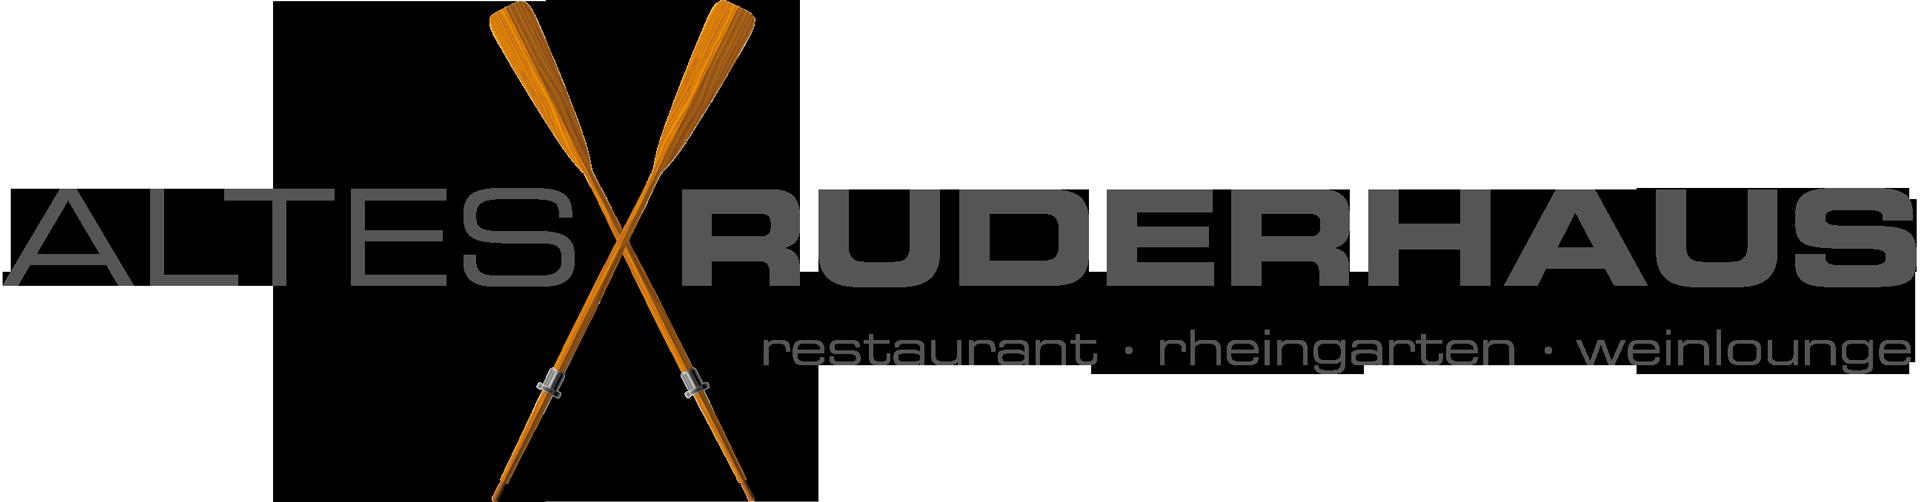 Logo Altes Ruderhaus Restaurant Biergarten